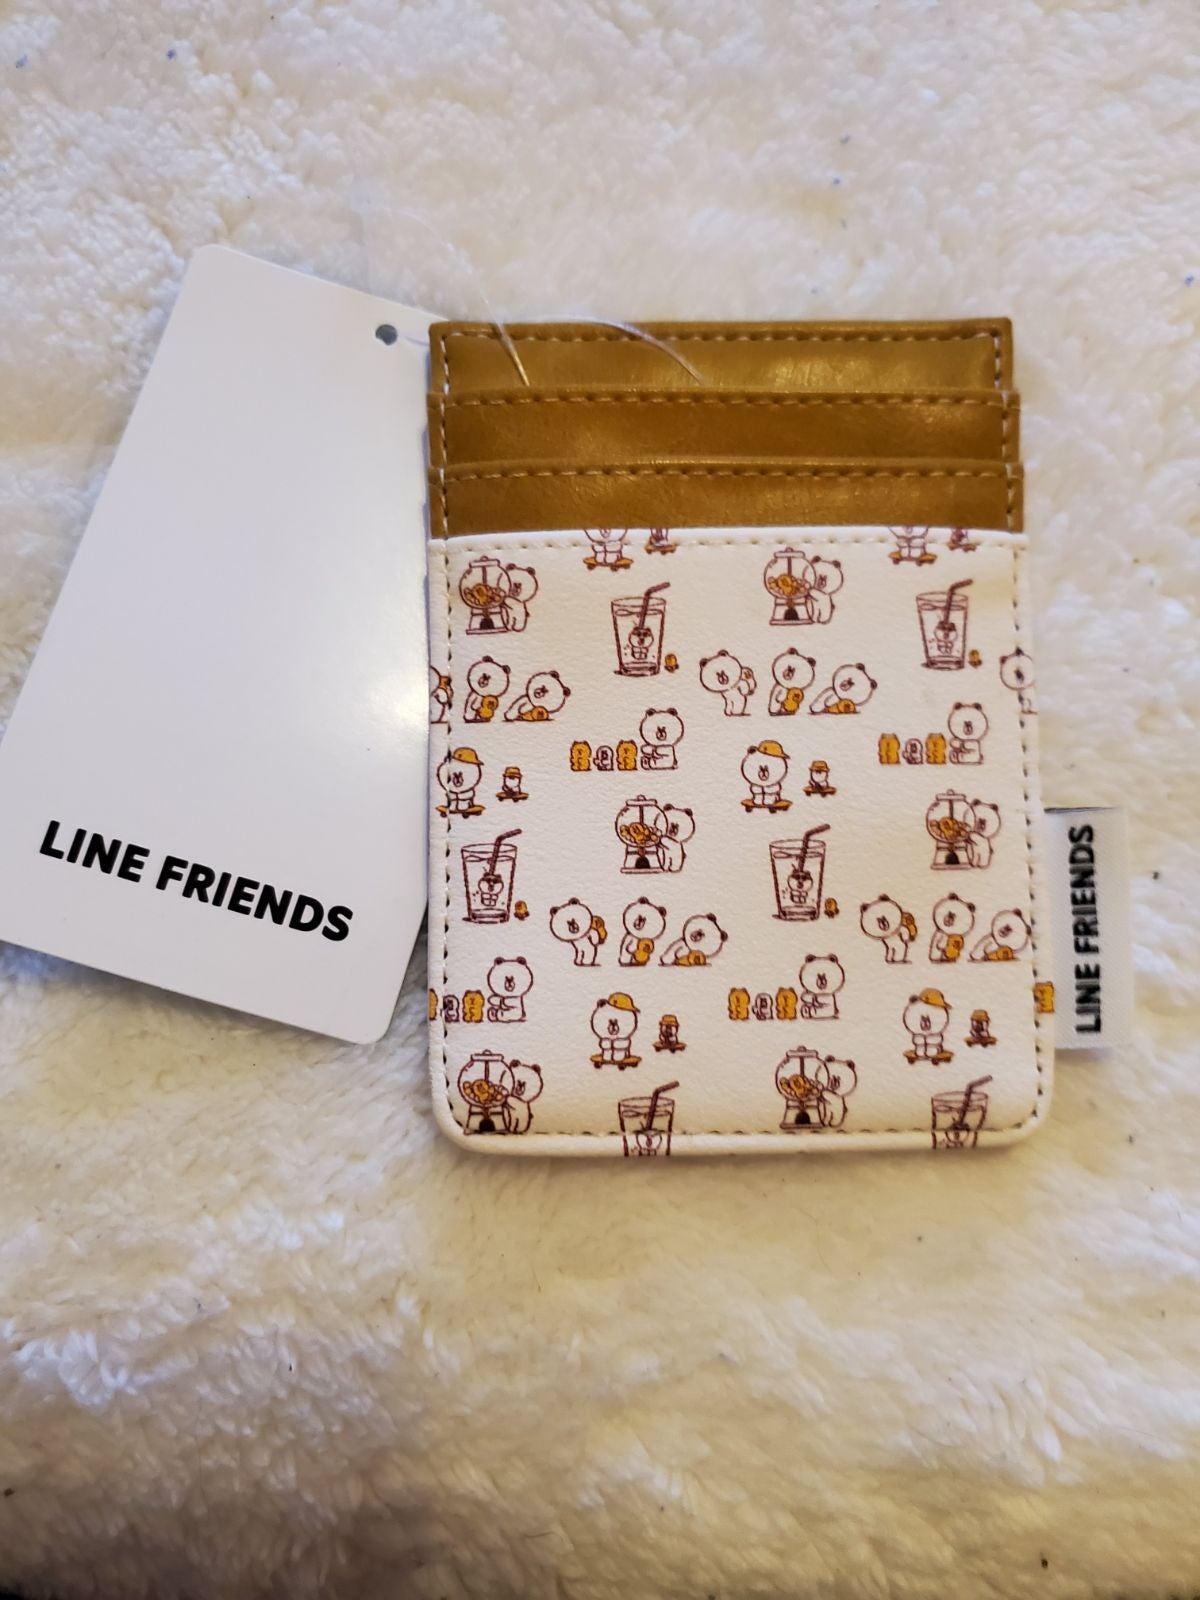 Line Friends card holder